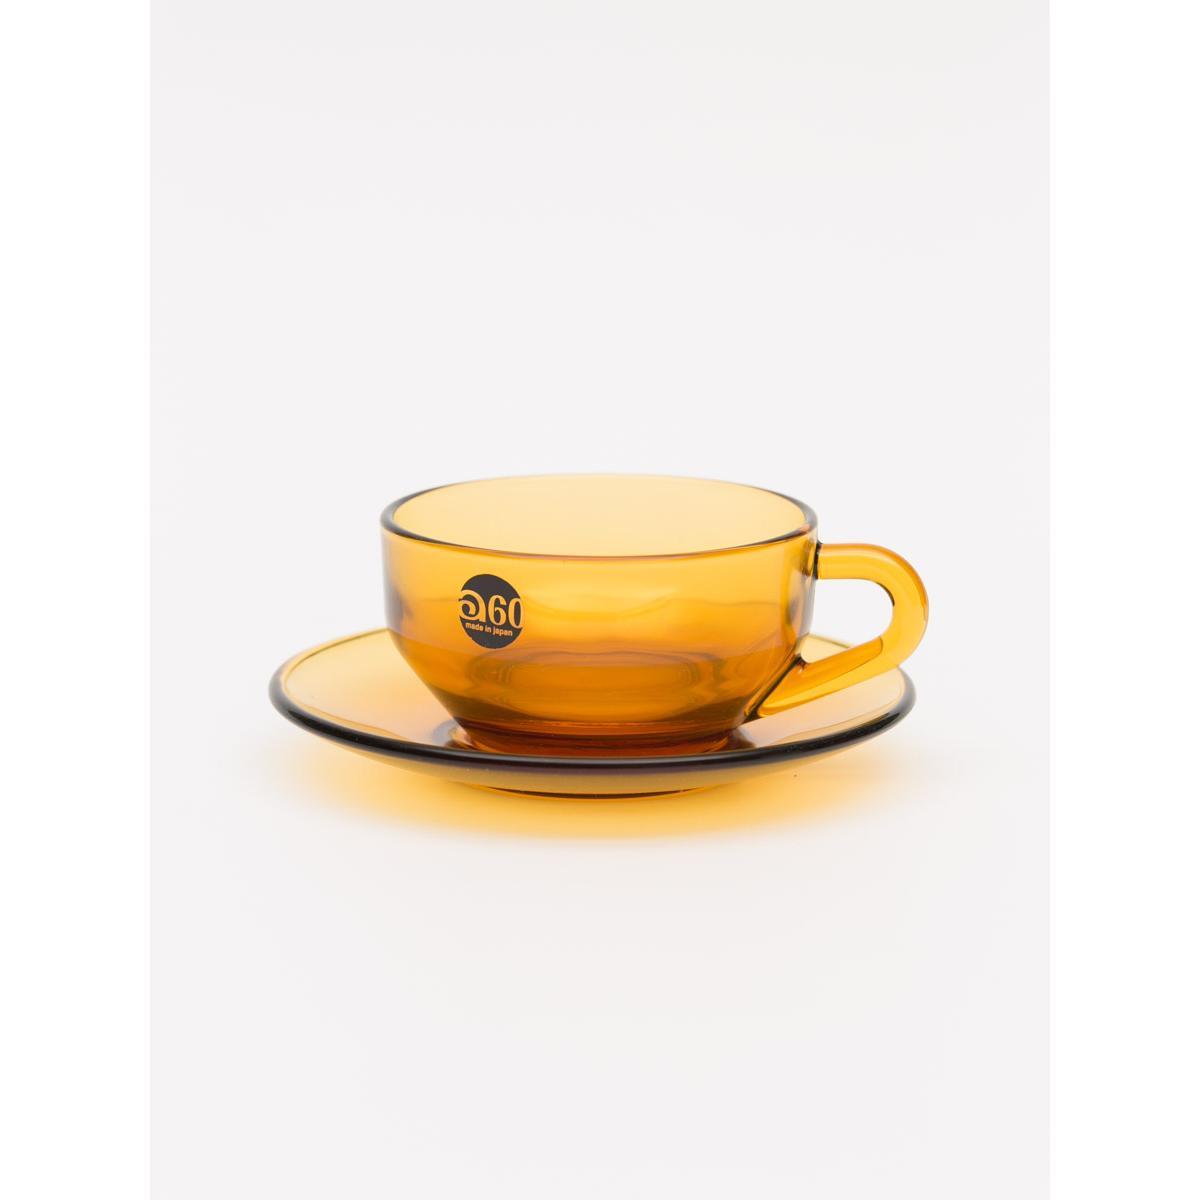 180ml Glass coffee set - Amber